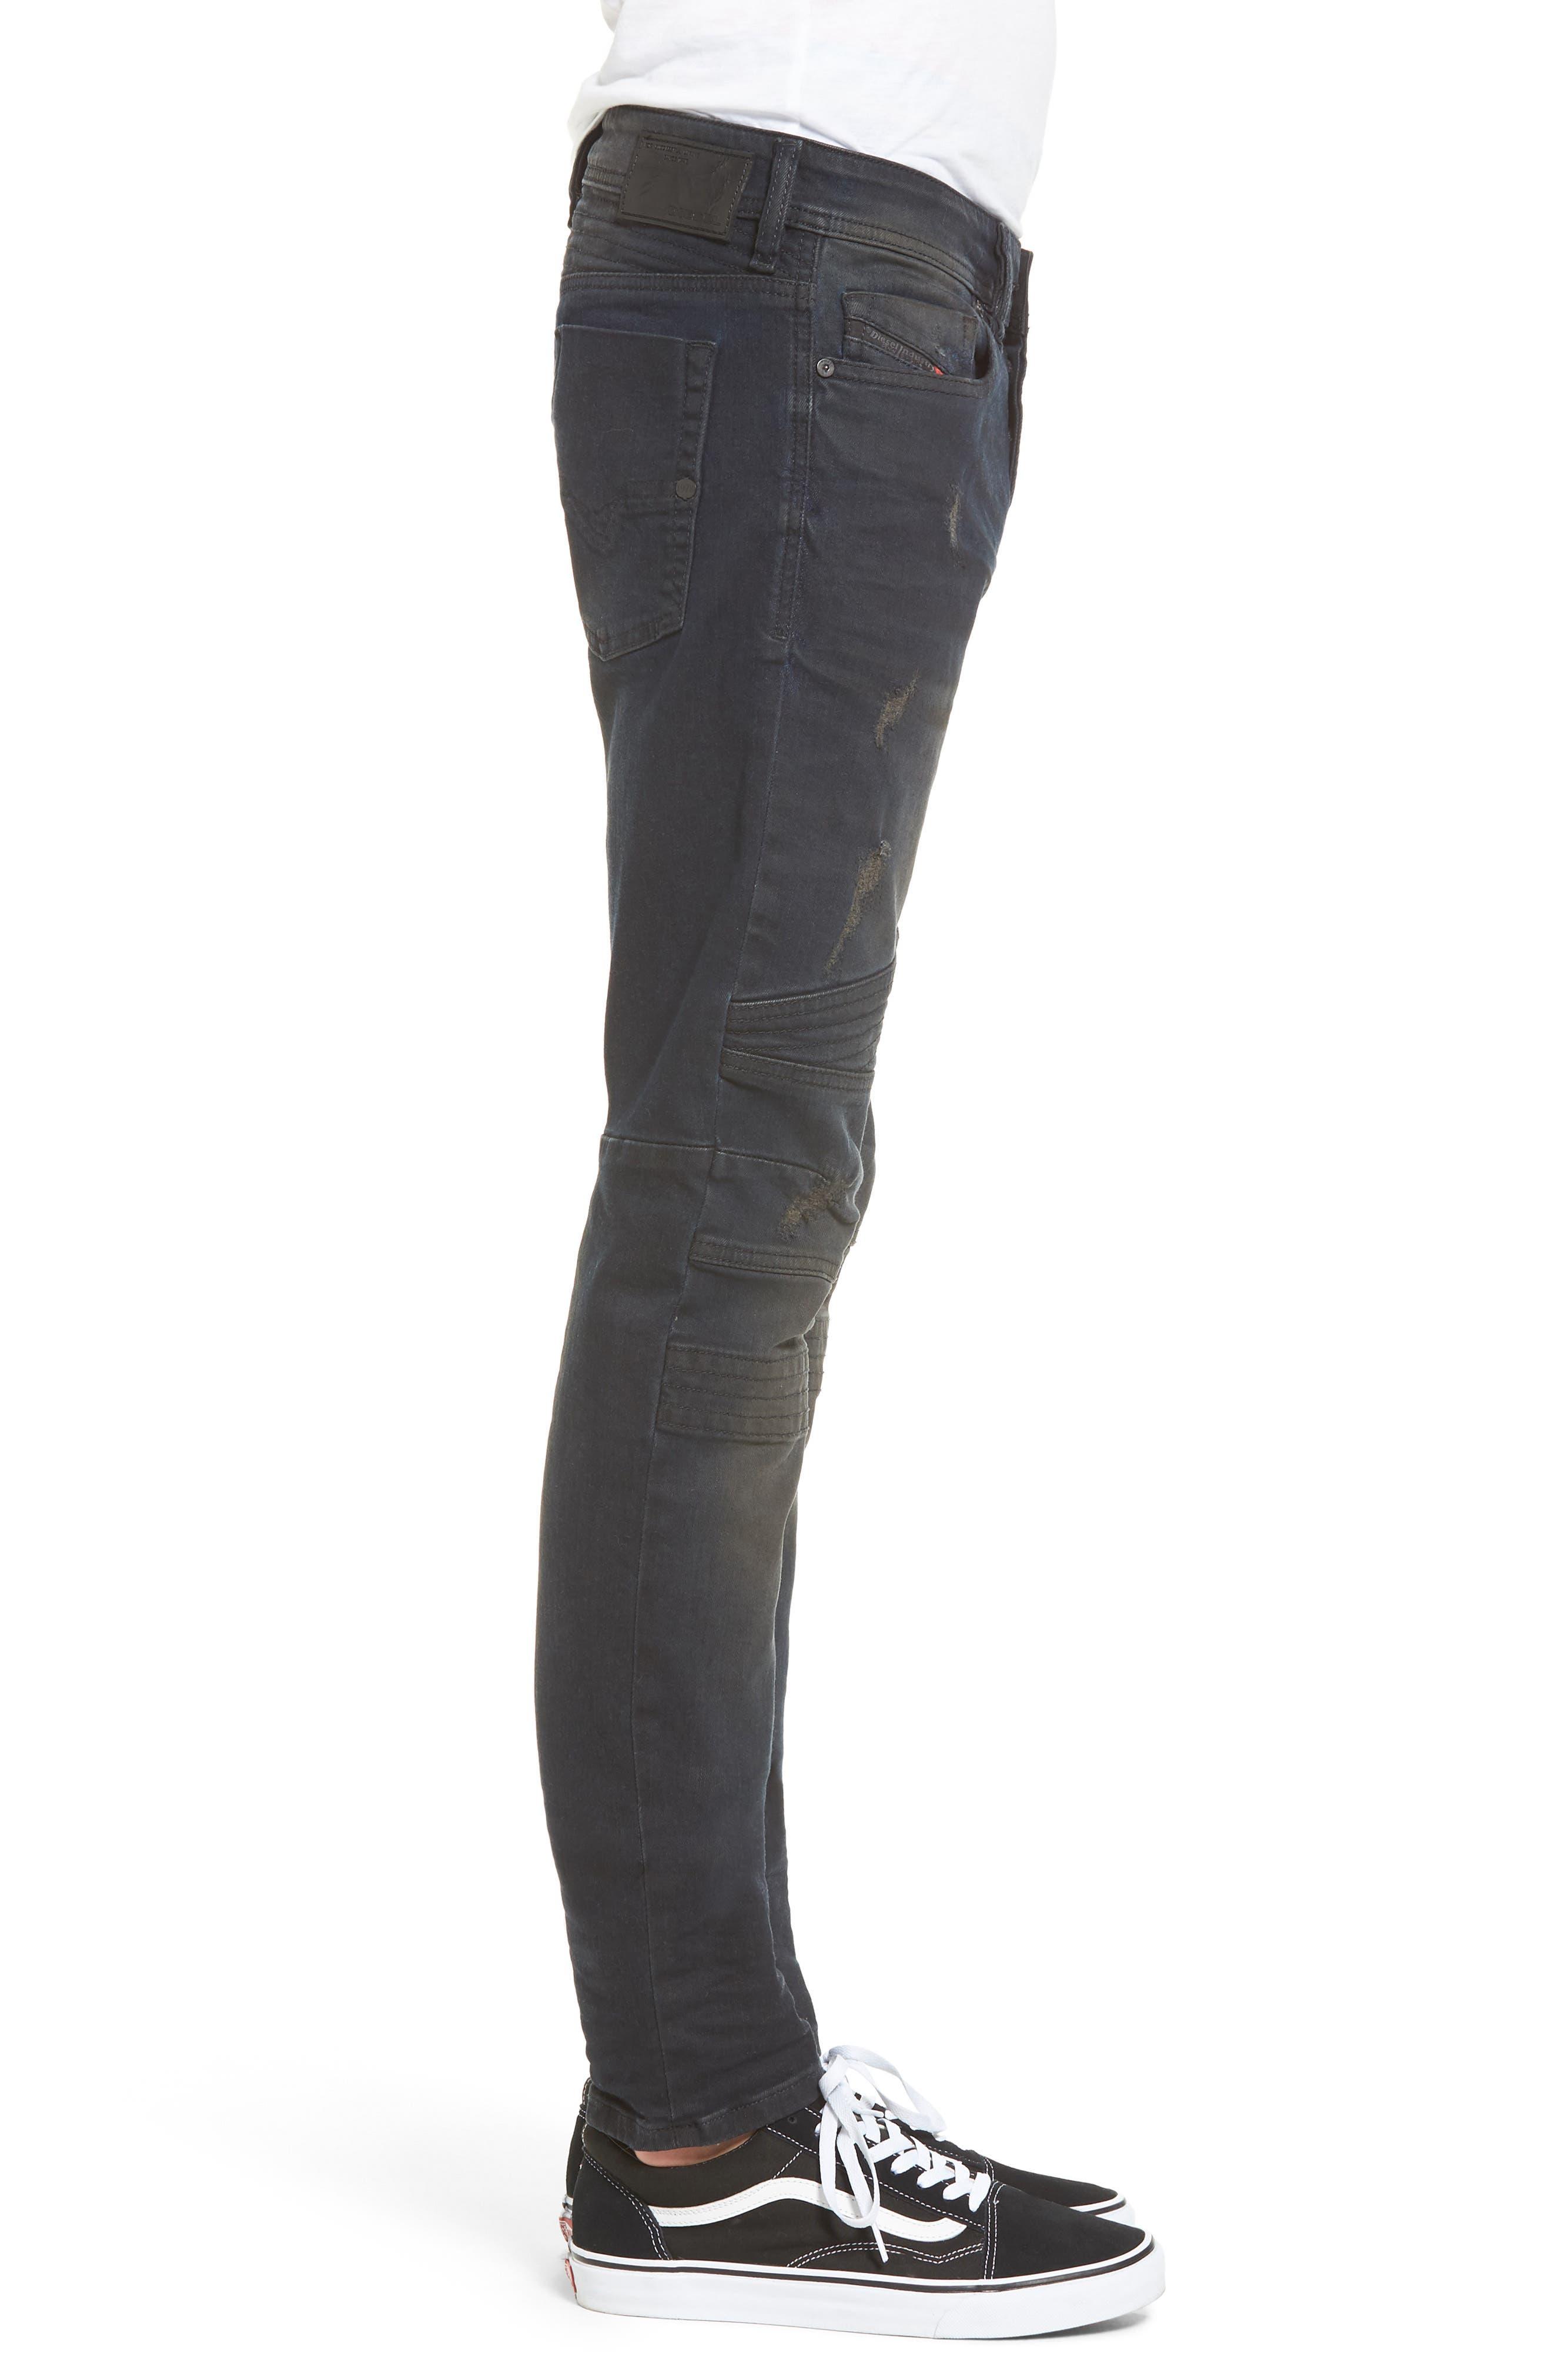 Fourk Skinny Fit Jeans,                             Alternate thumbnail 3, color,                             Denim